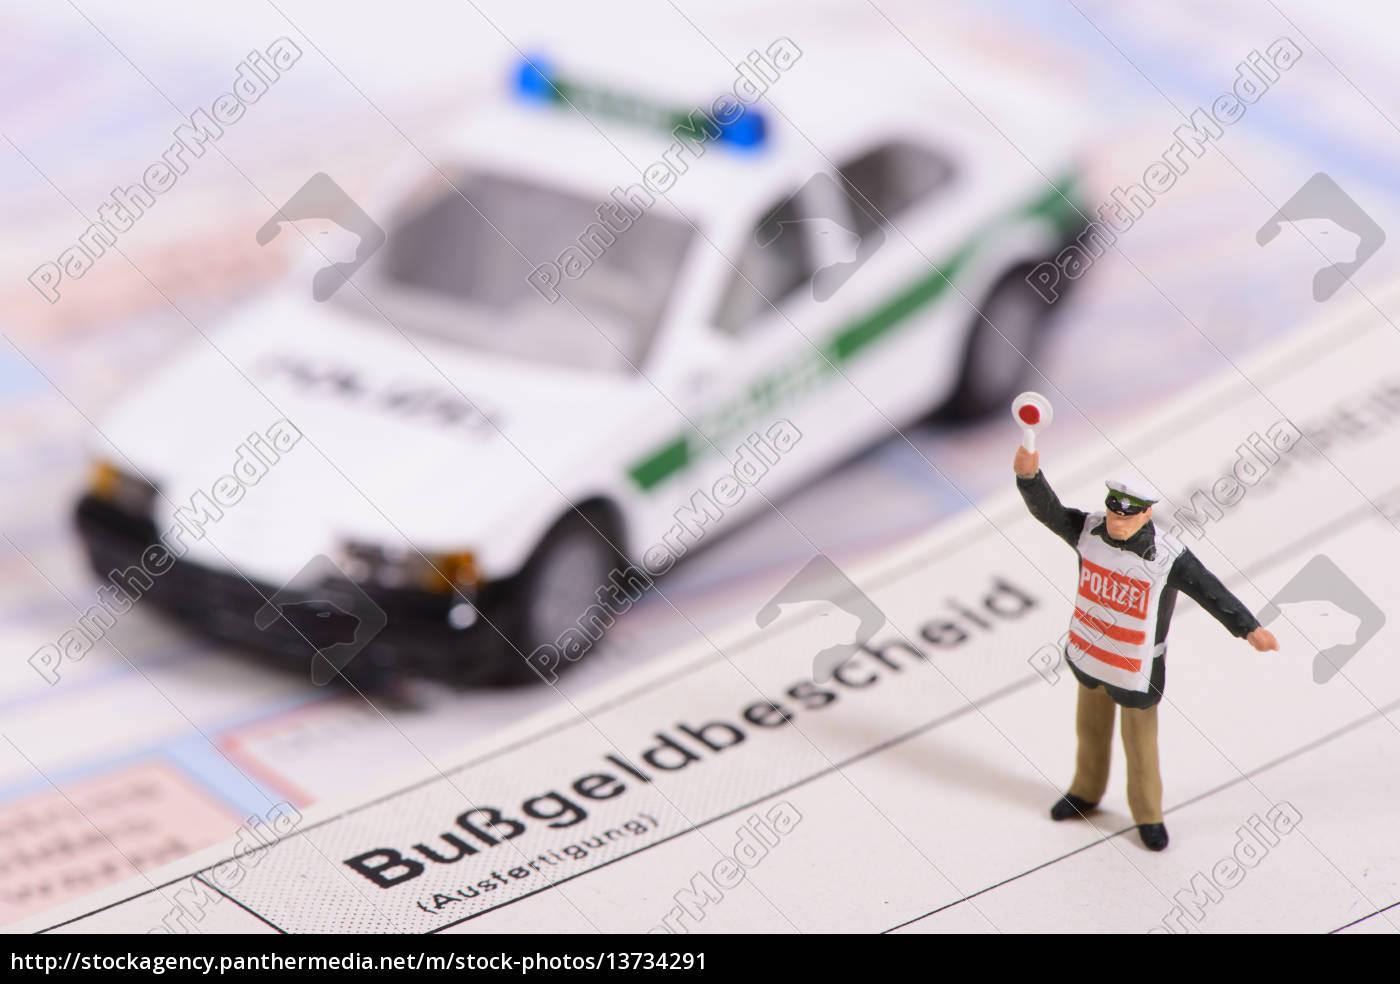 bußgeldbescheid, bei, verkehrskontrolle - 13734291